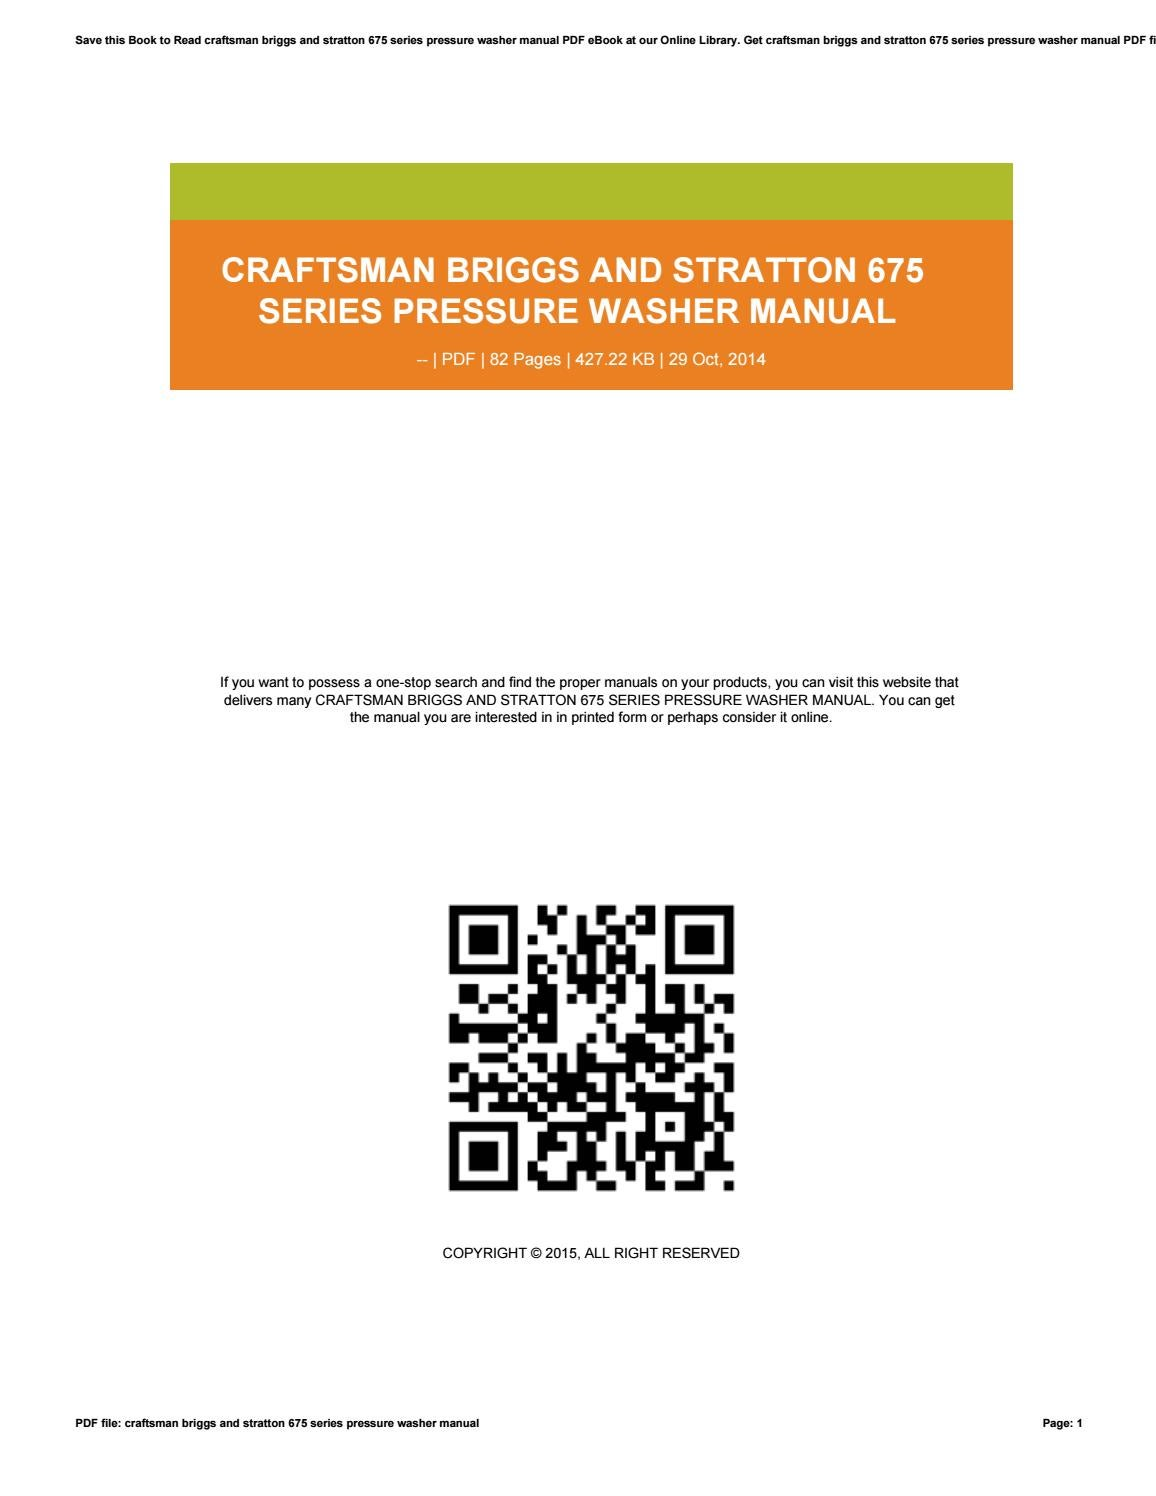 Craftsman briggs and stratton 675 series pressure washer manual by  jklasdf75 - issuu